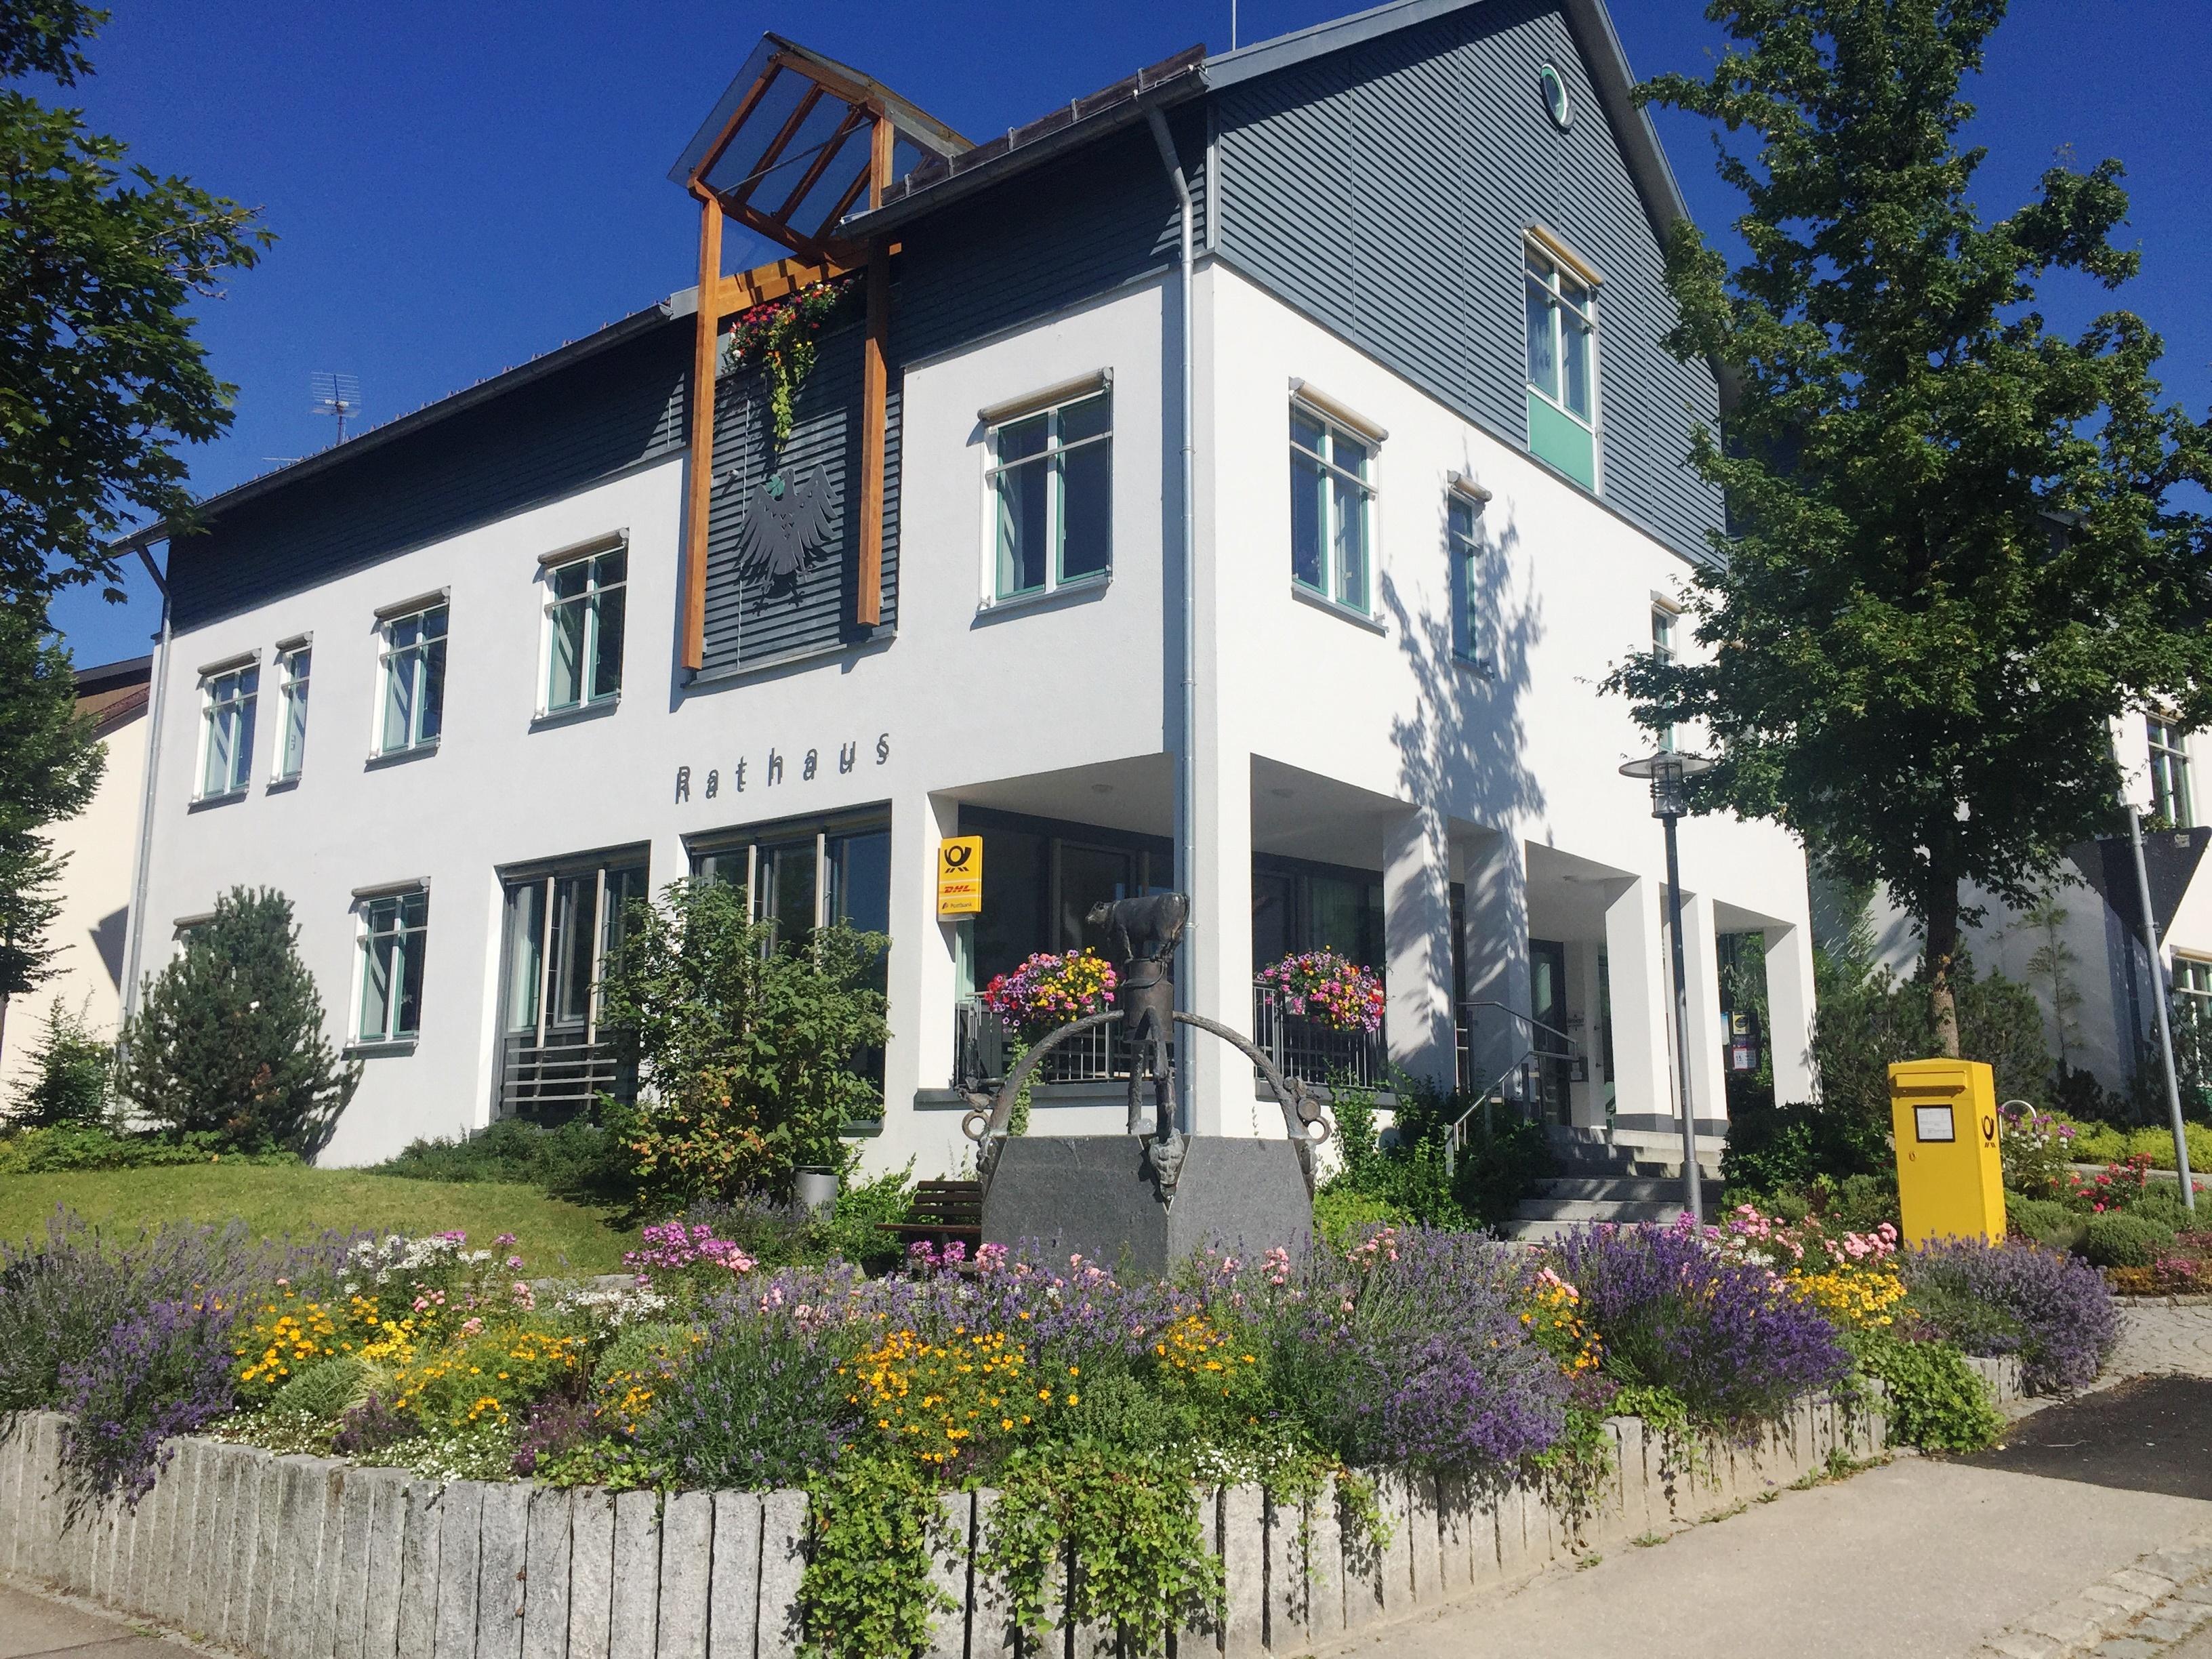 Rathaus Eisenharz